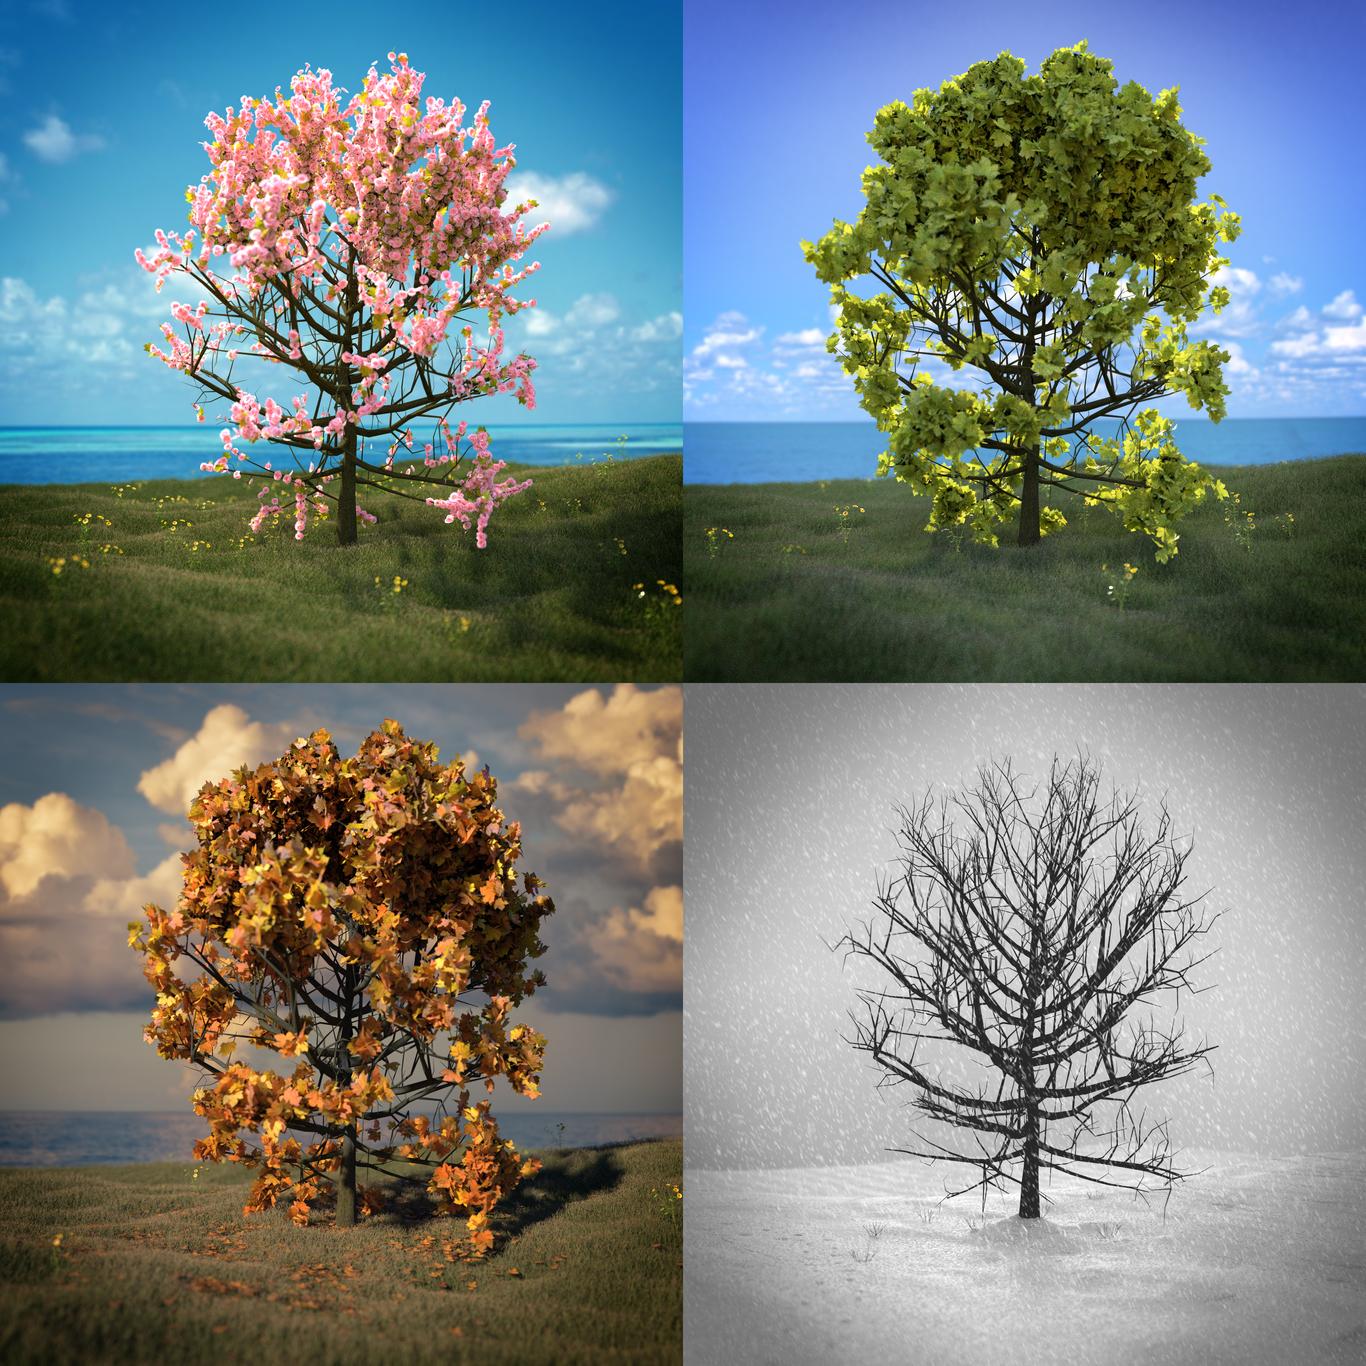 Guipah four seasons 1 49c4fbdc mwgz